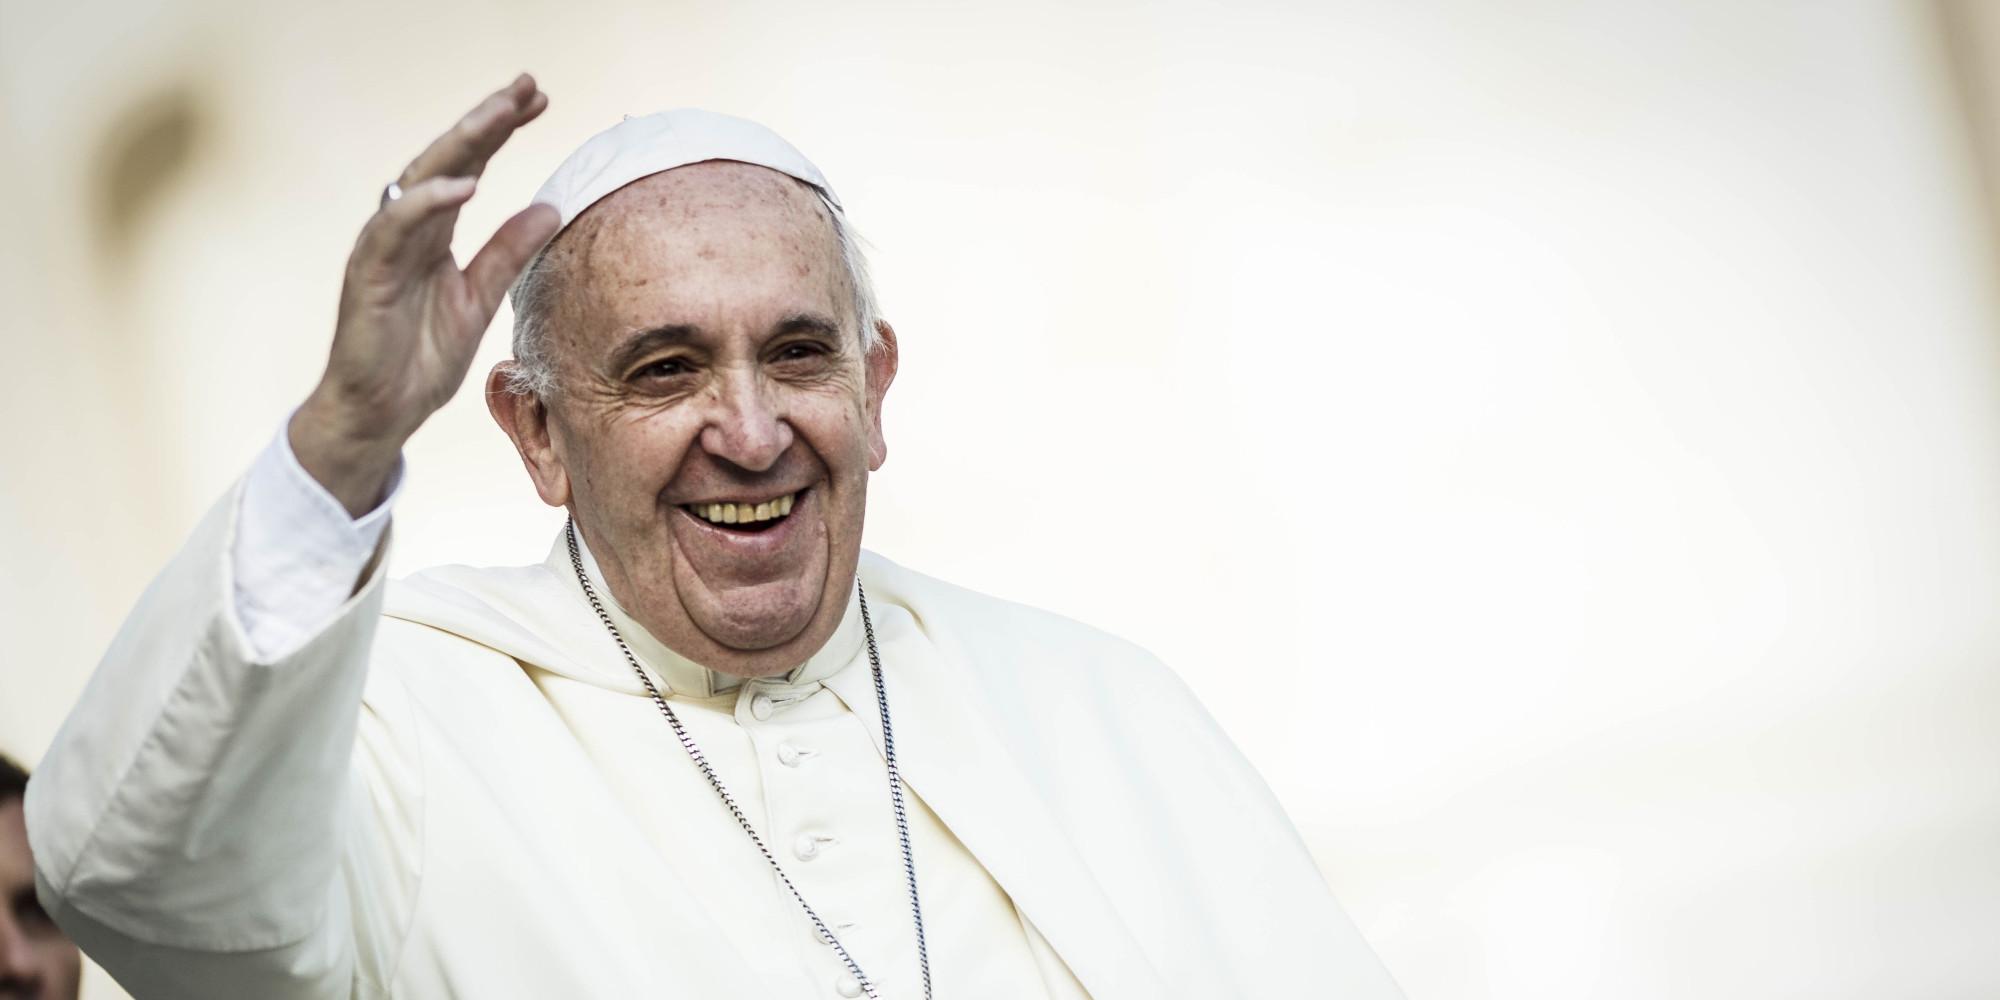 mary pflum peterson thanks pope francis legitimizing divorce